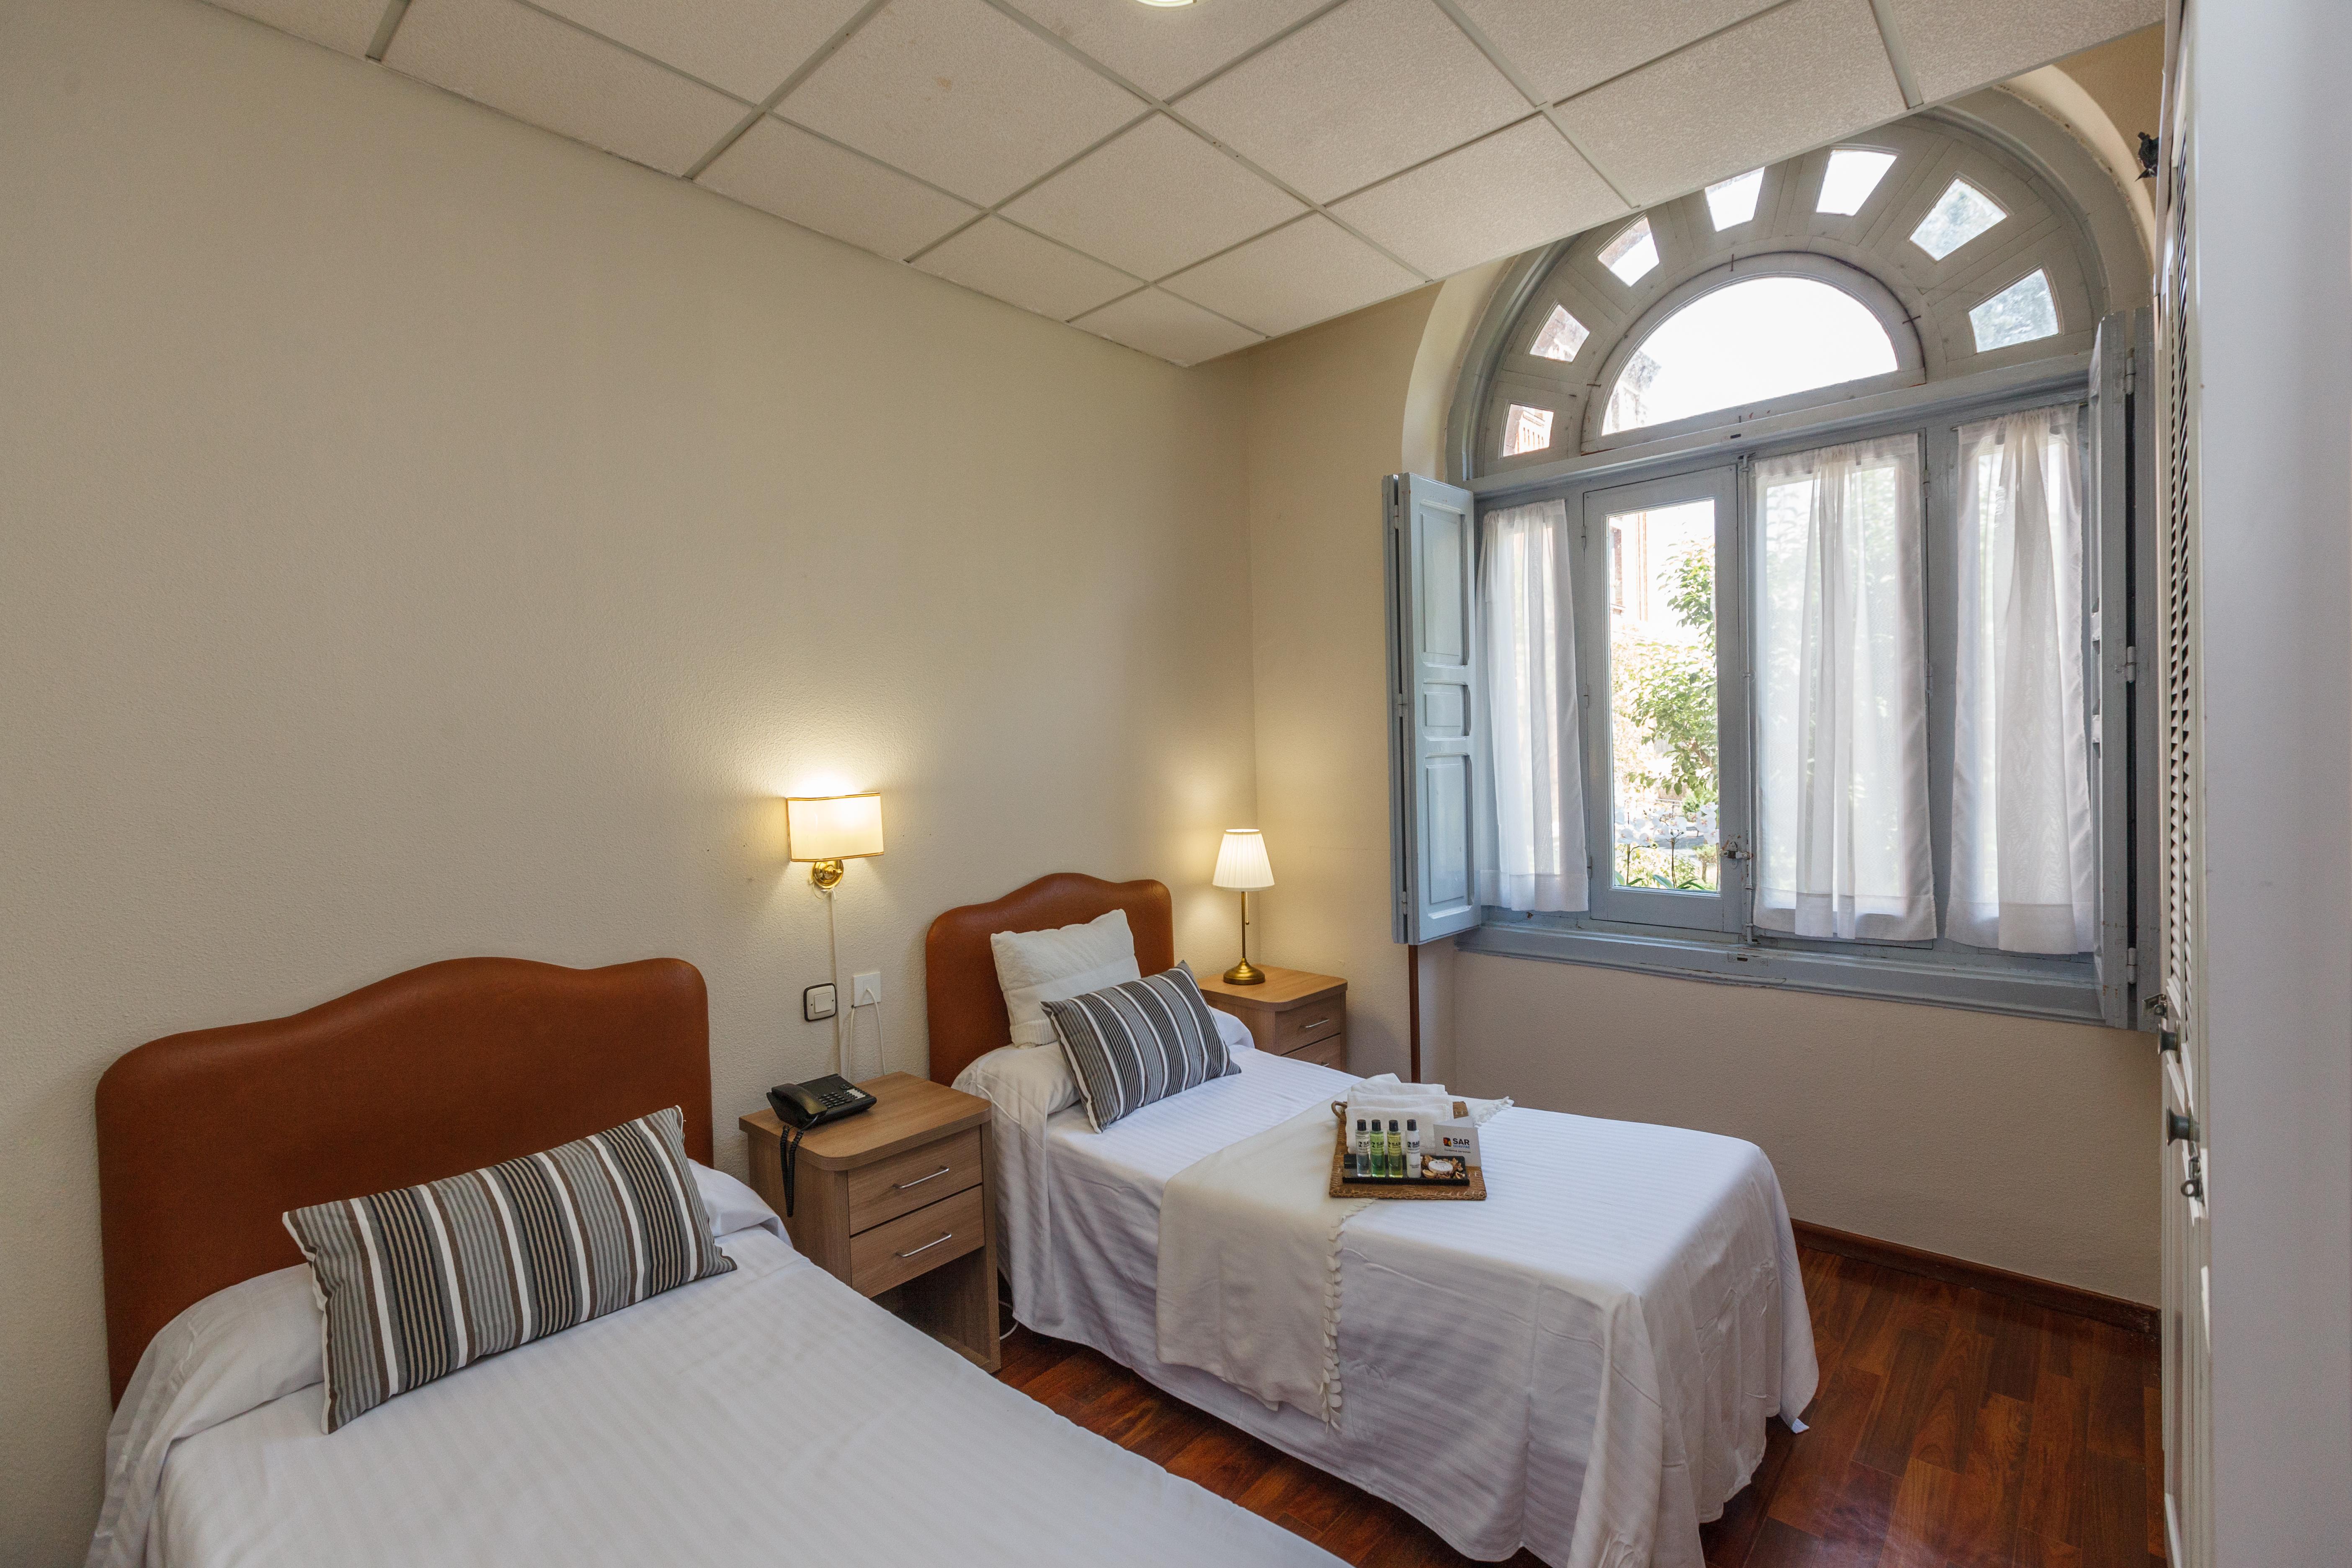 Residencia domusvi real deleite for Busco trabajo en aranjuez